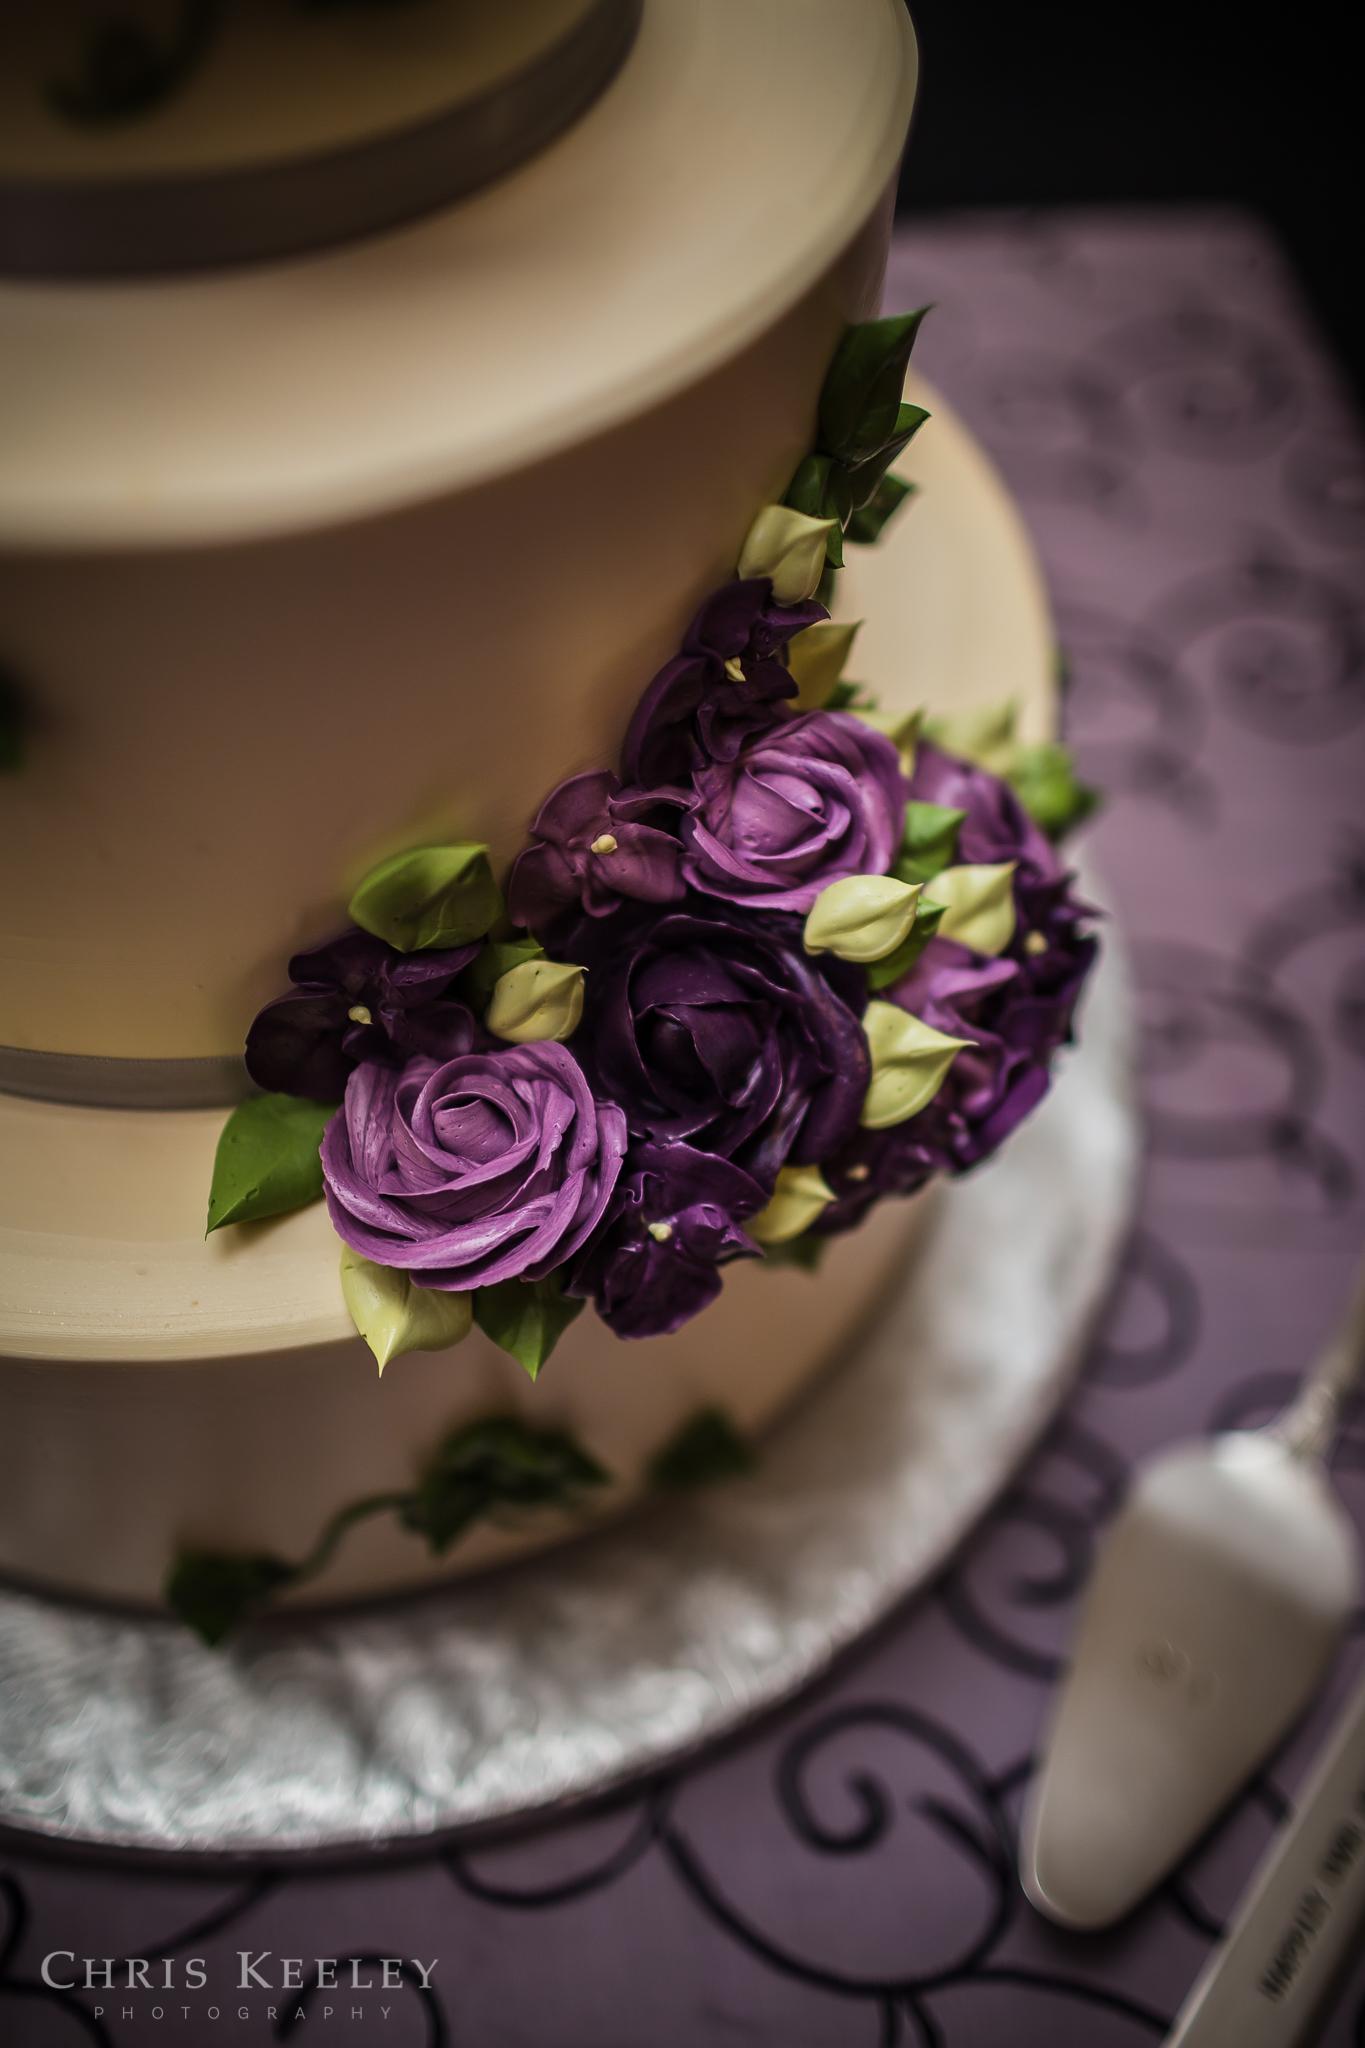 new-hampshire-wedding-photographer-three-chimneys-inn-chris-keeley-photography-21.jpg